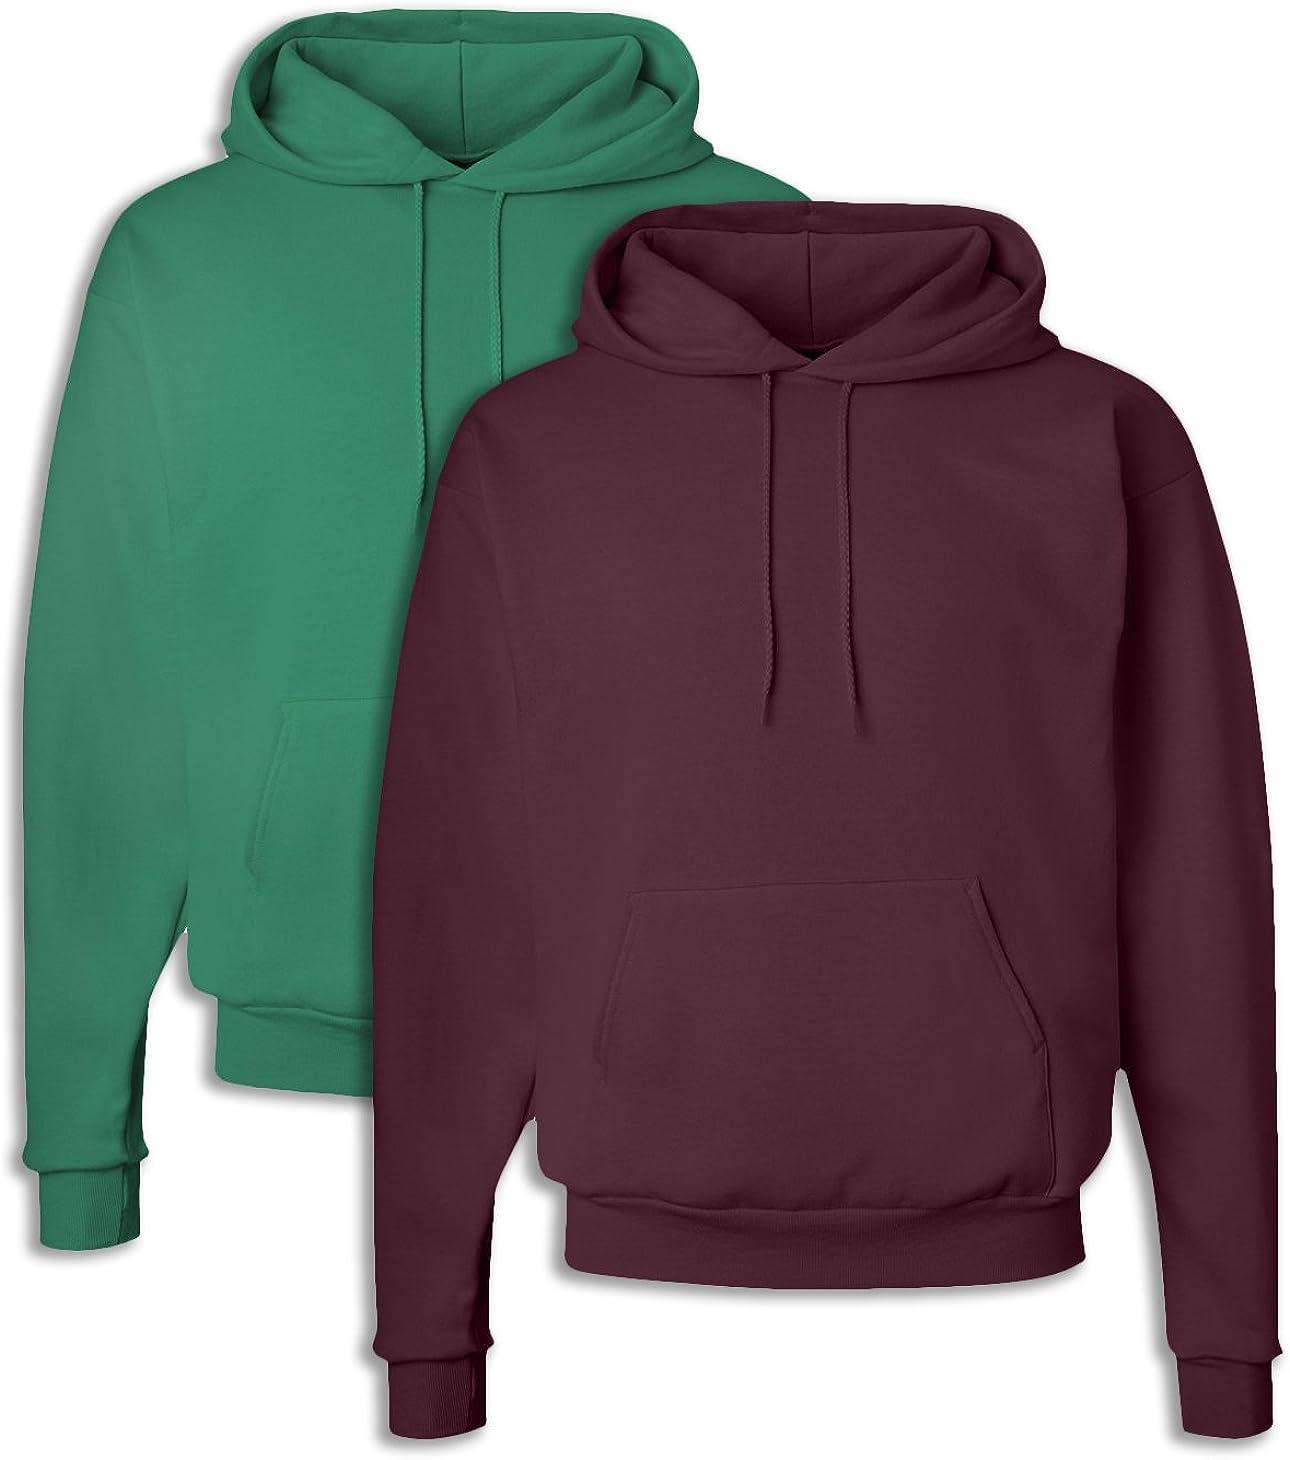 1 Maroon Hanes P170 Mens EcoSmart Hooded Sweatshirt 3XL 1 Kelly